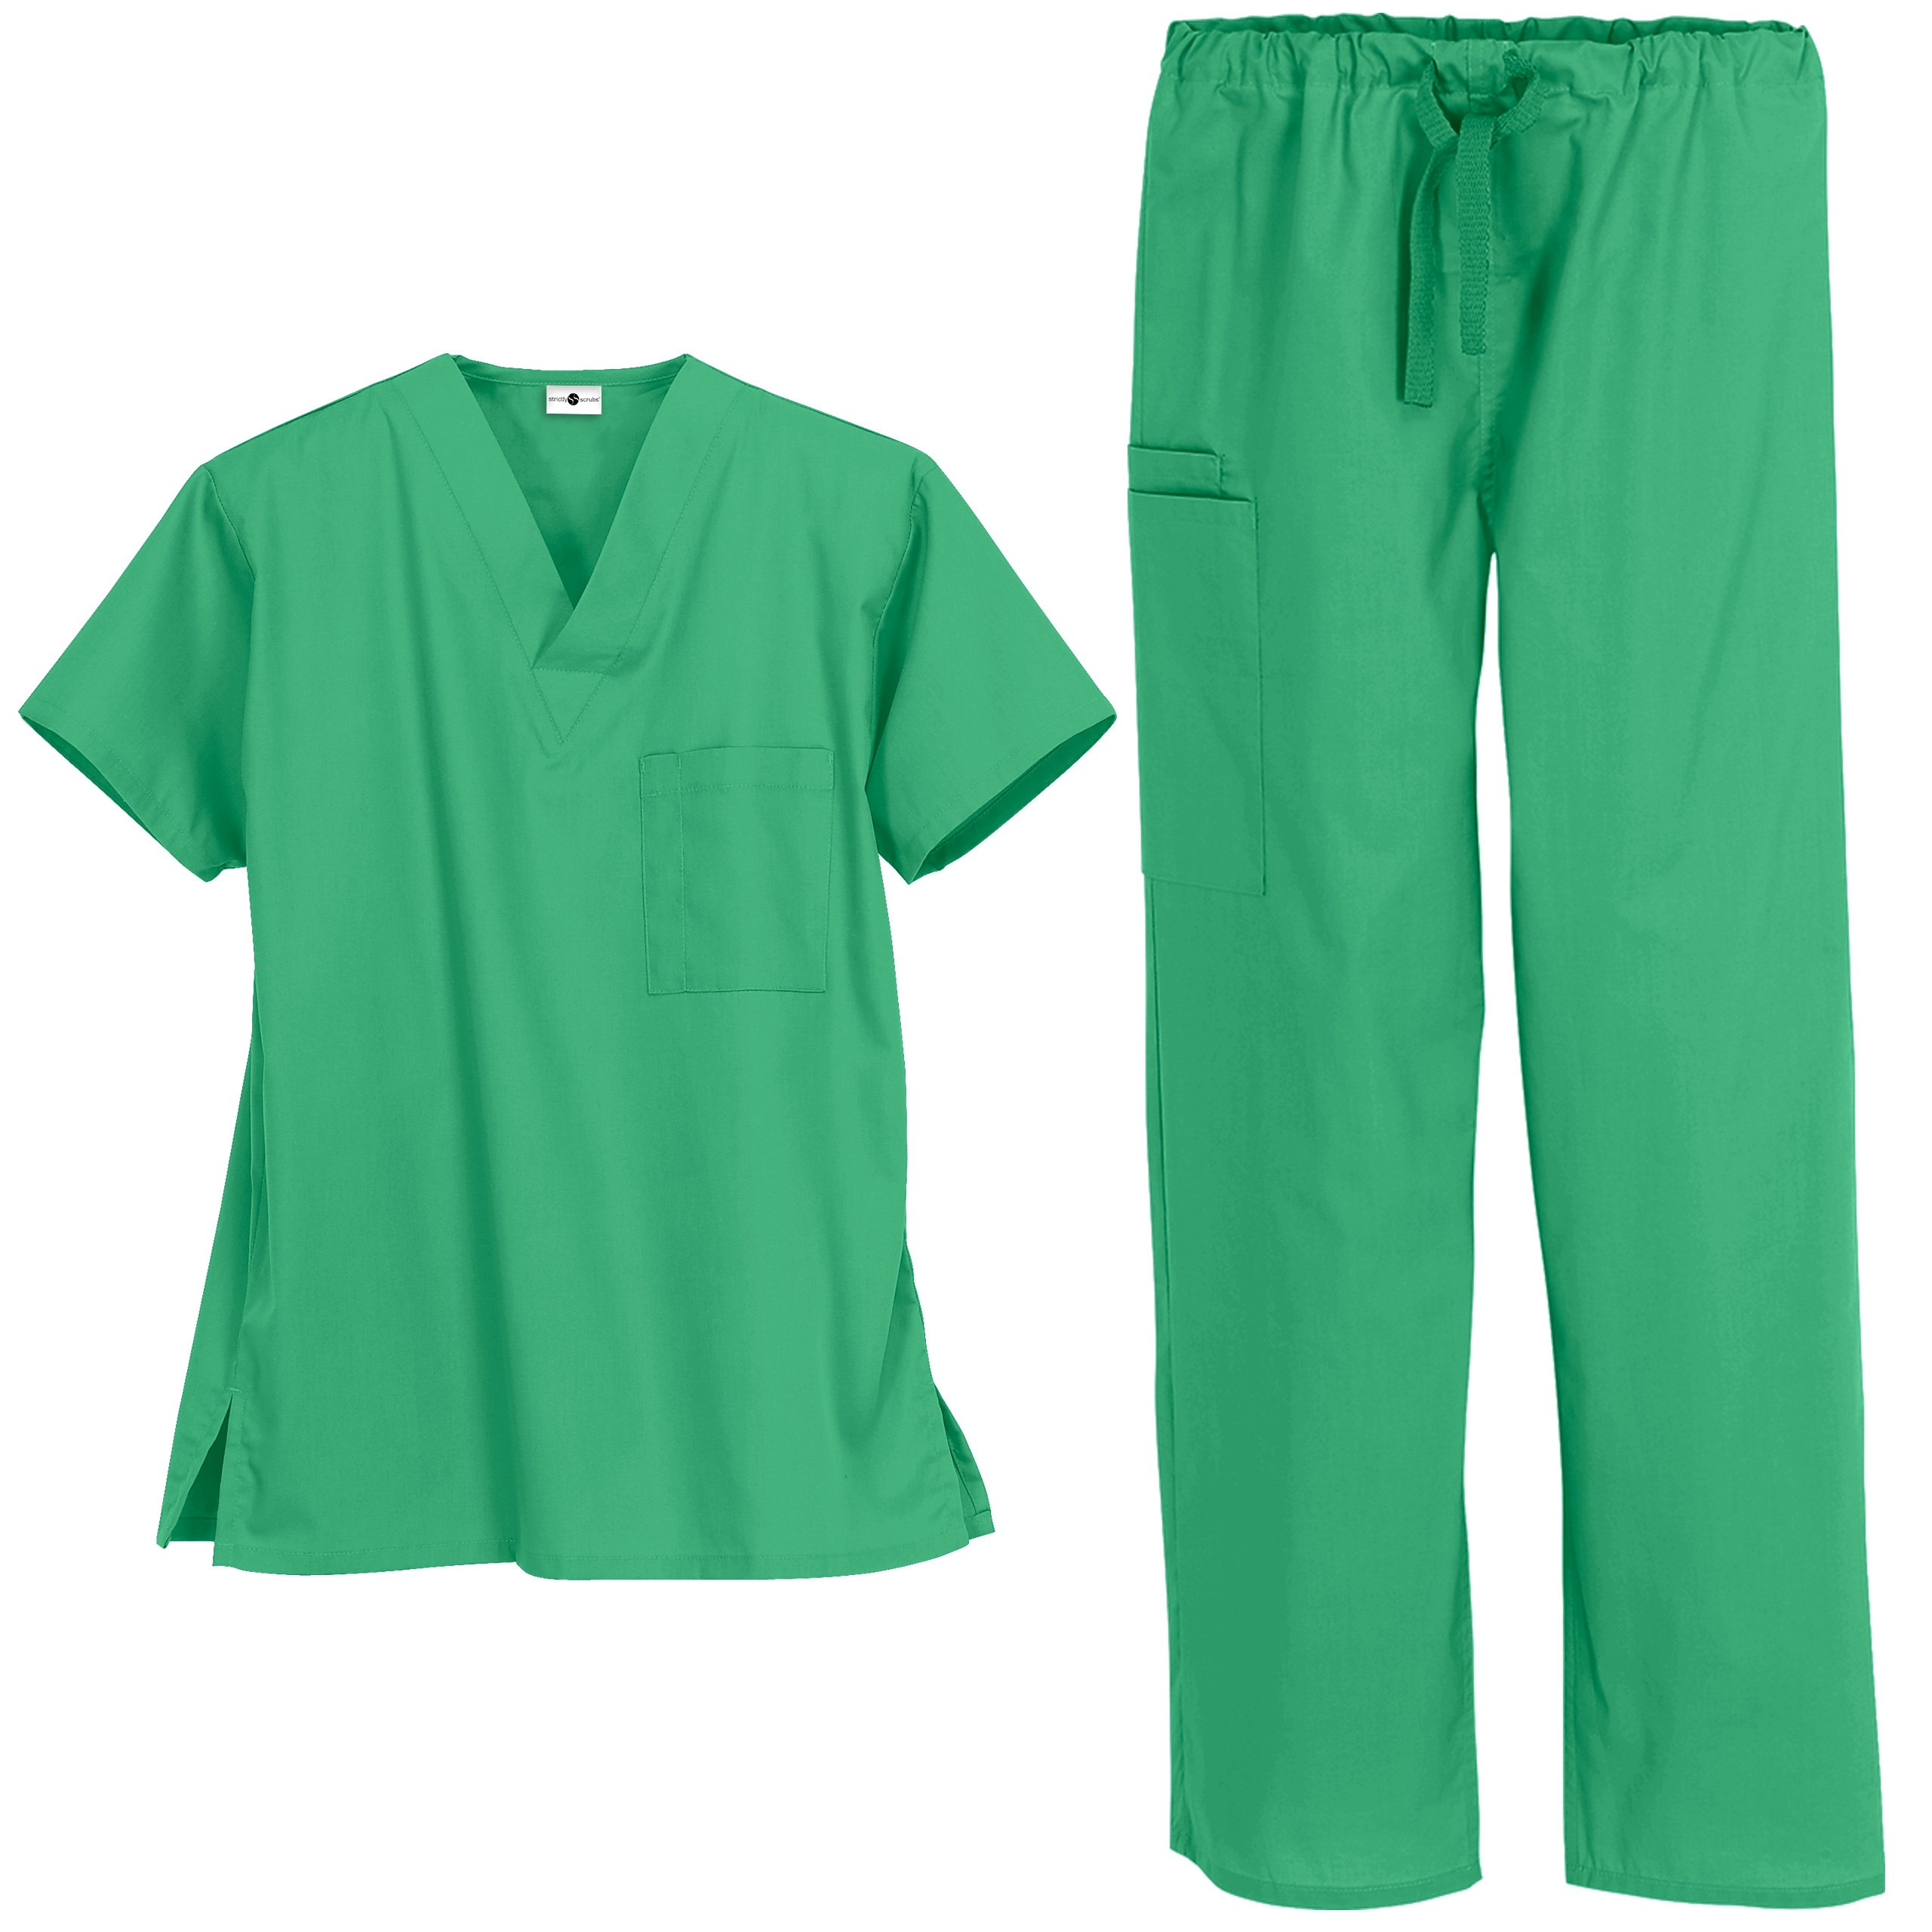 Unisex Medical Uniform Scrub Set – Includes V-Neck Top and Drawstring Pant (XS-3X, 13 Colors) (XX-Large, Jade)